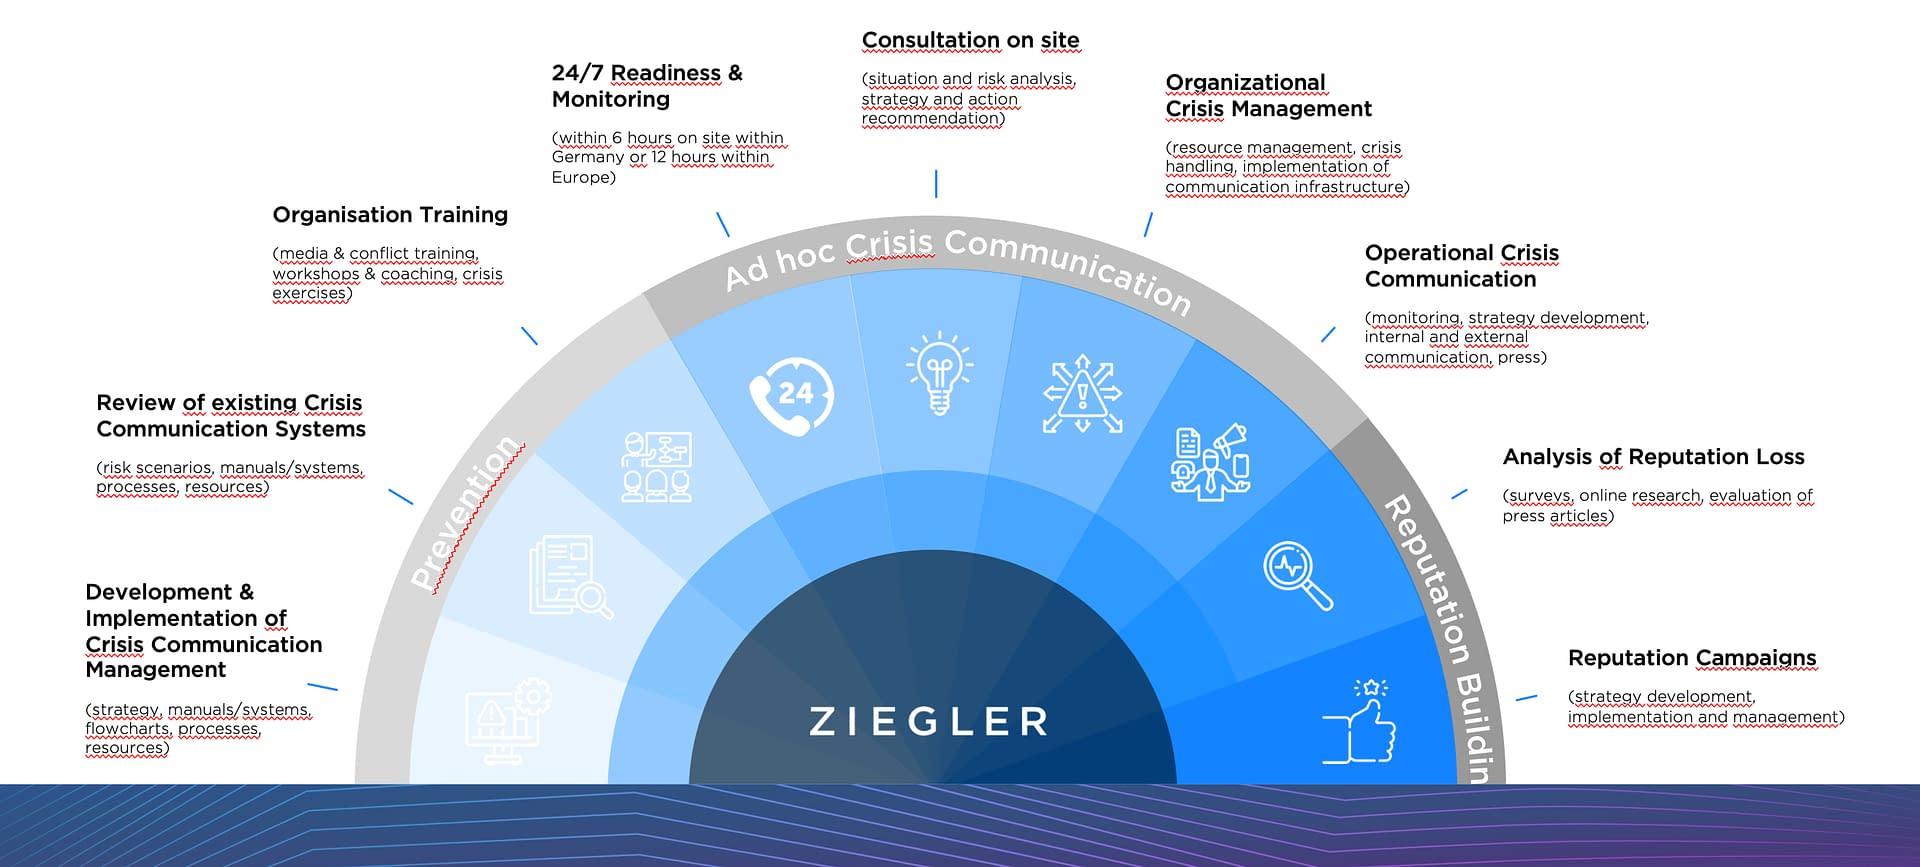 ZIEGLER Company Crisis Communication & Crisis Management